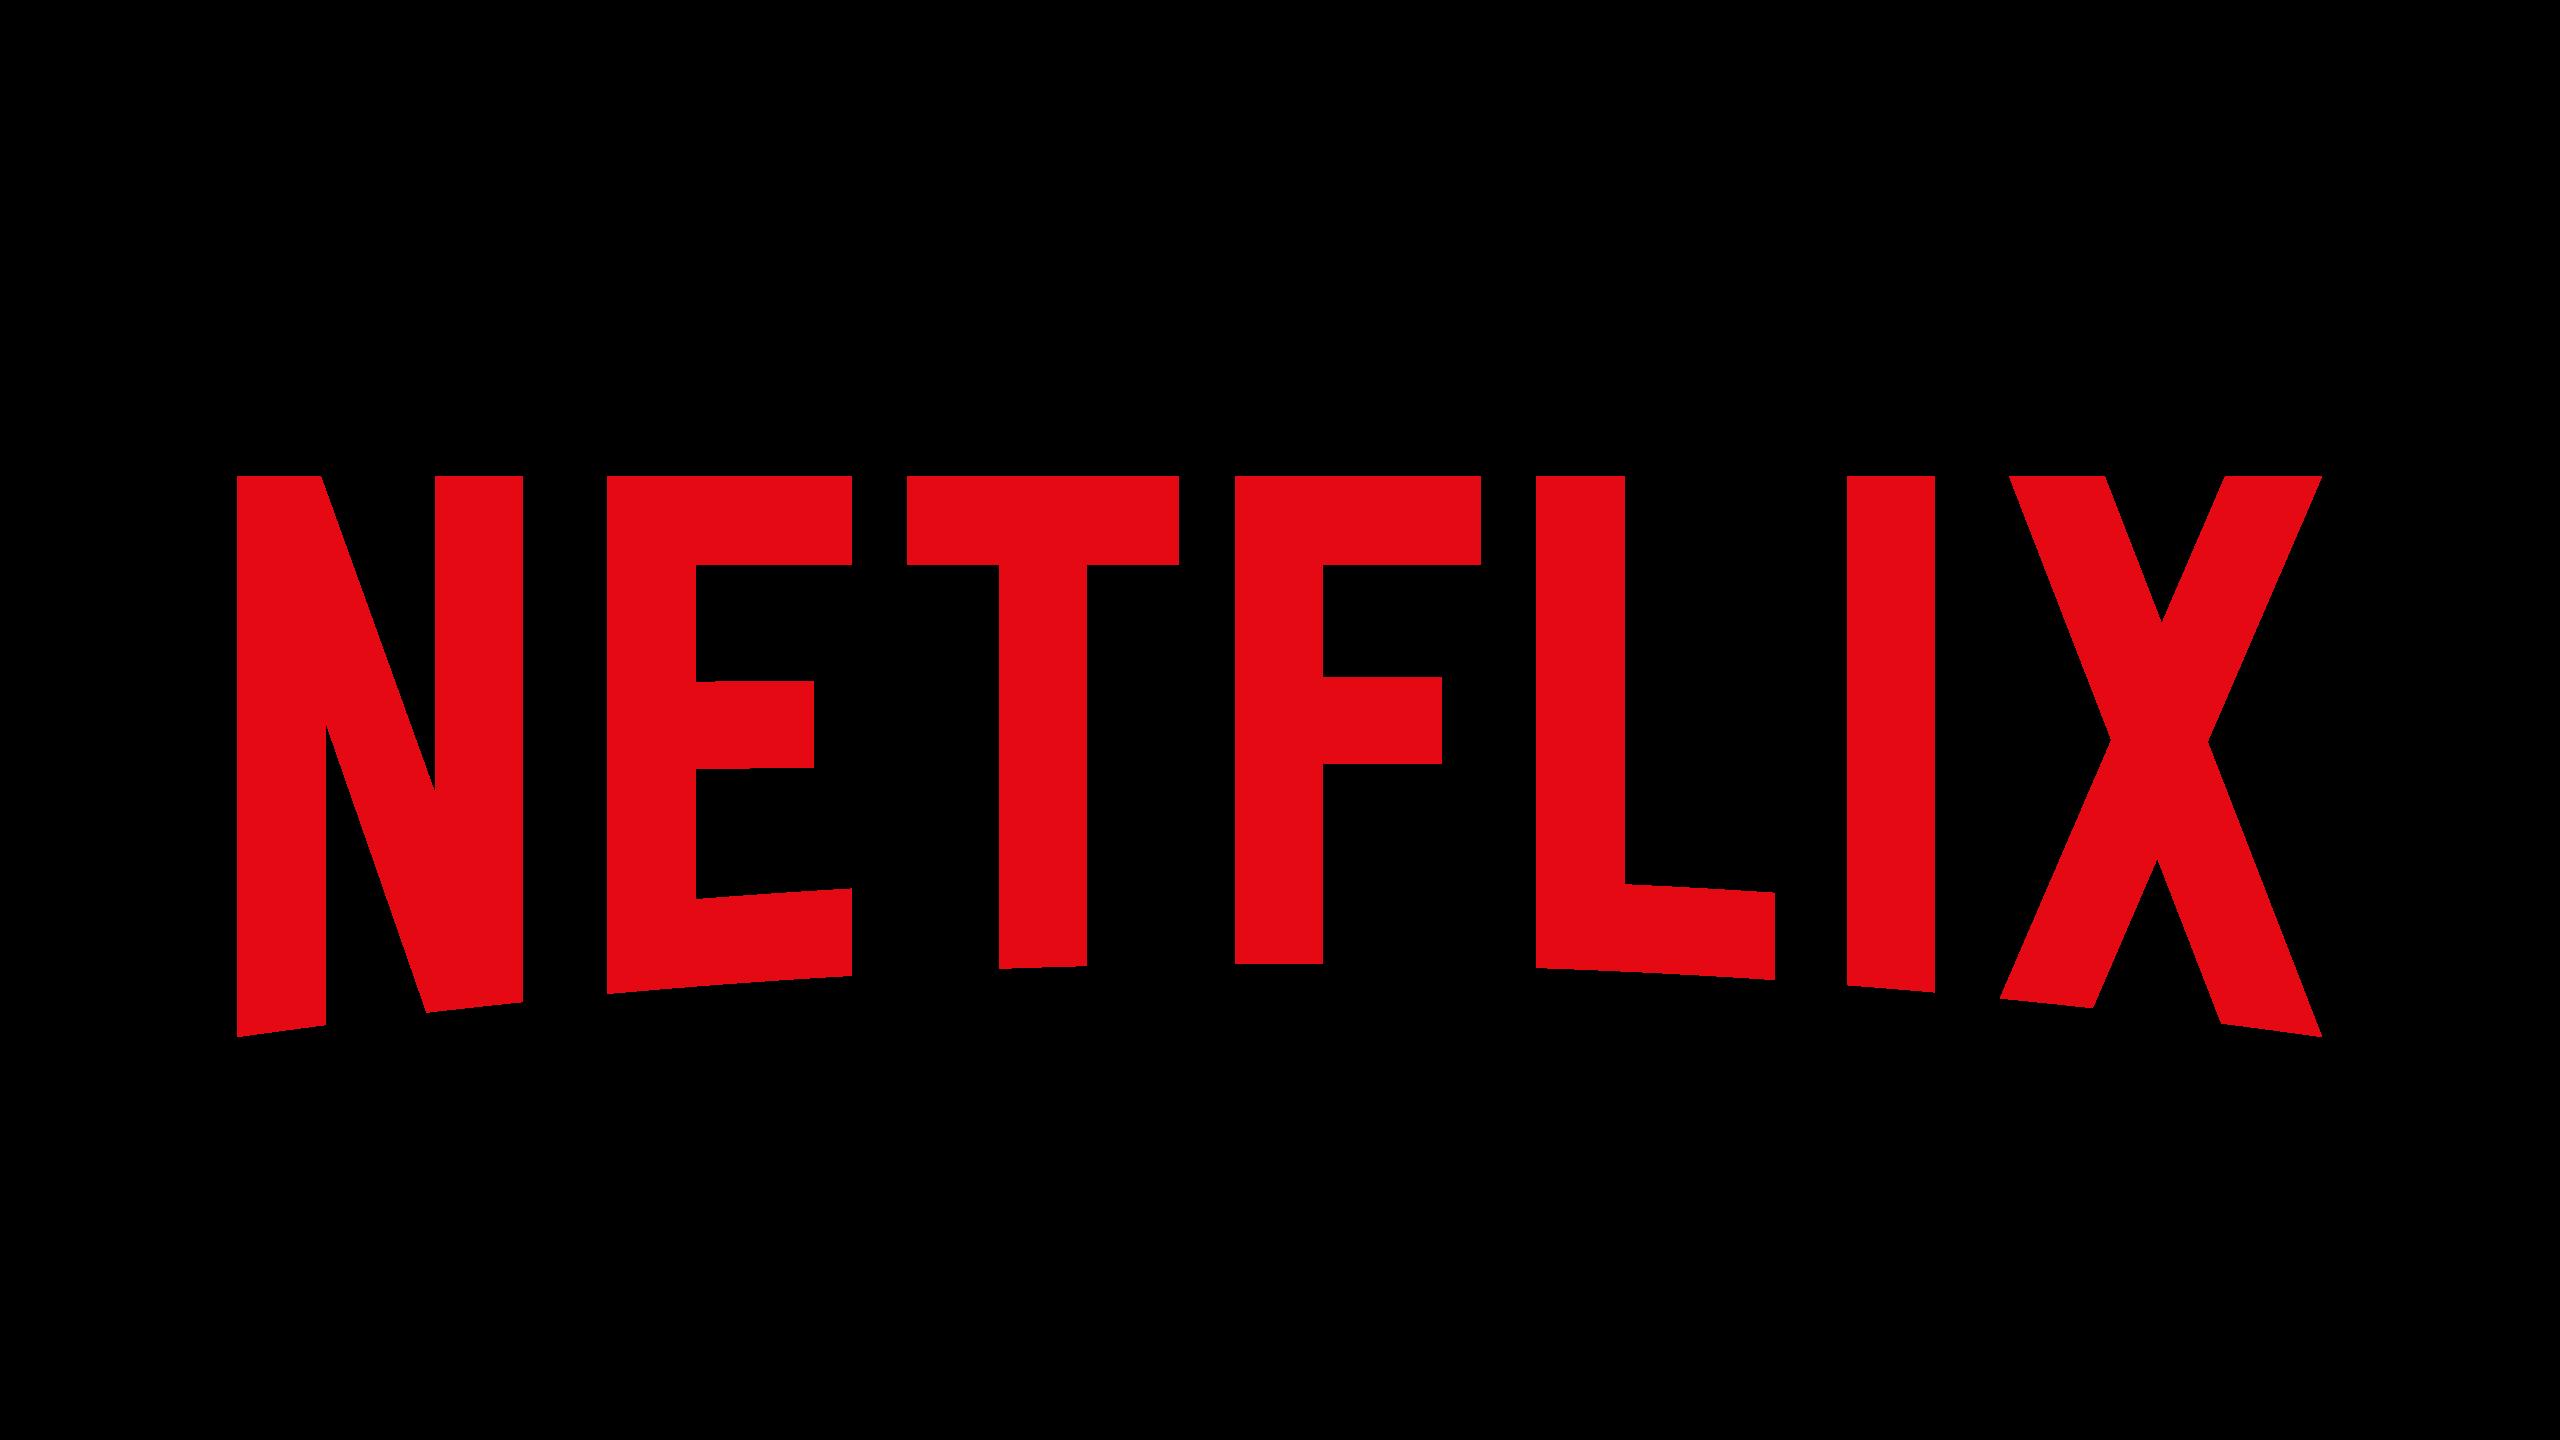 Netflix use node.js